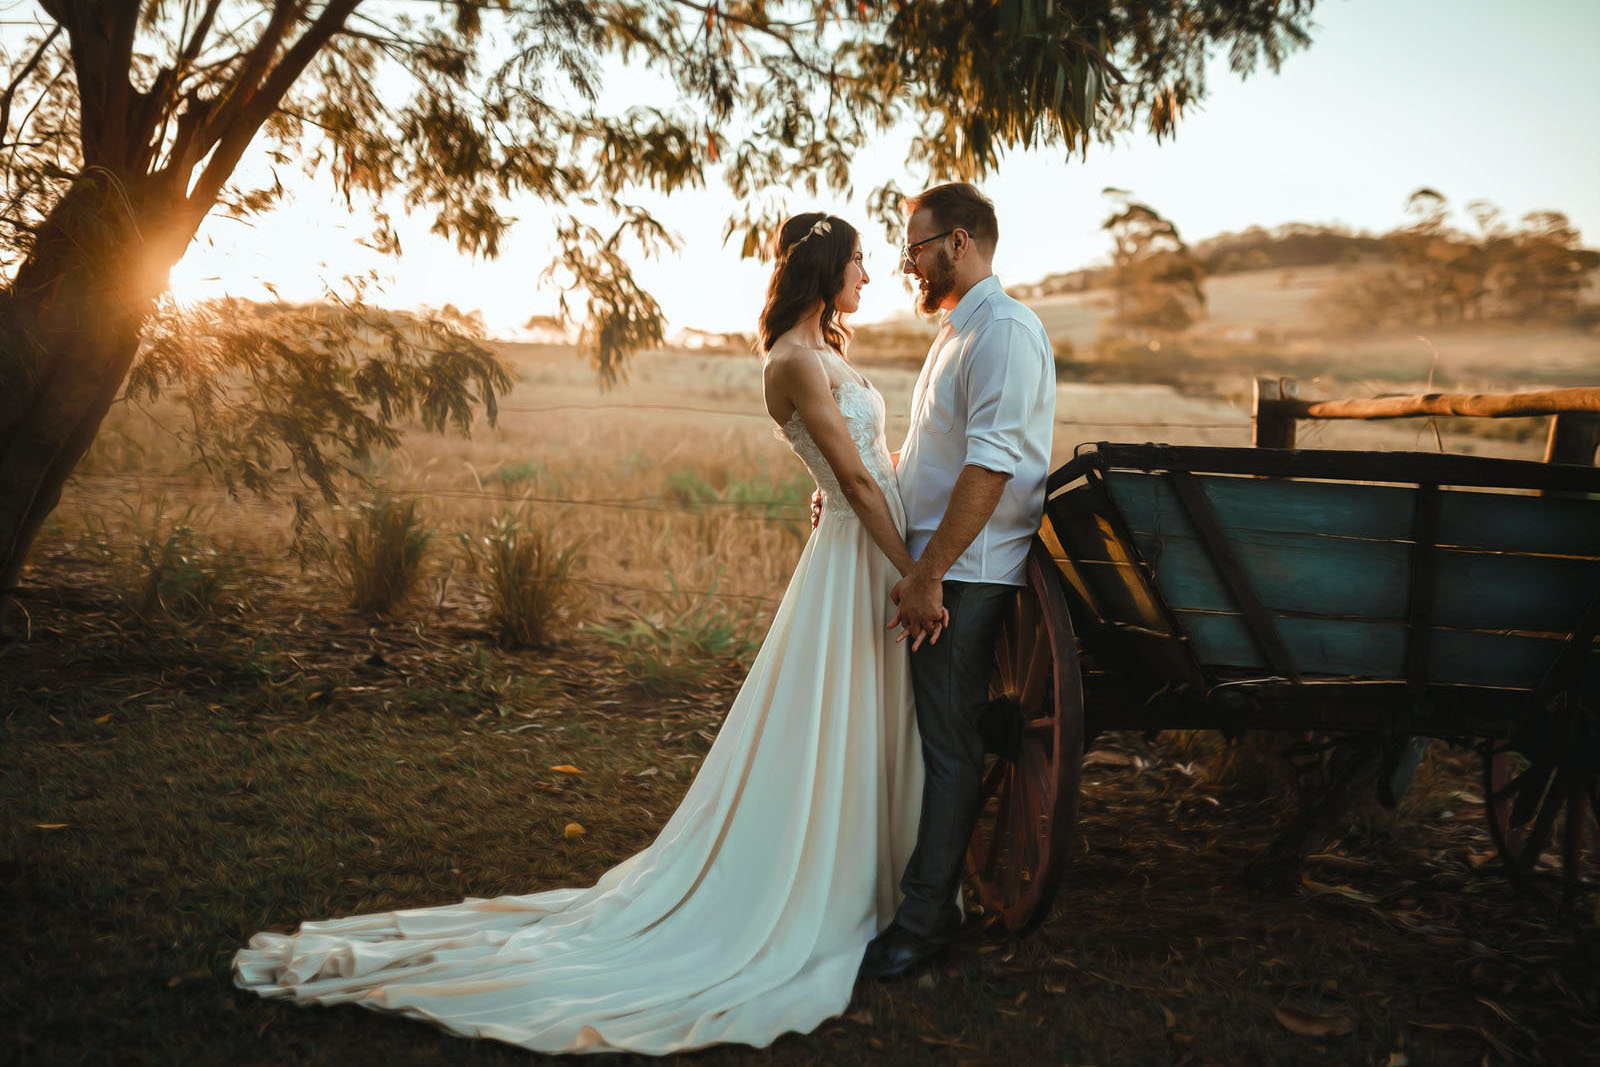 Autumn Equinox Wedding